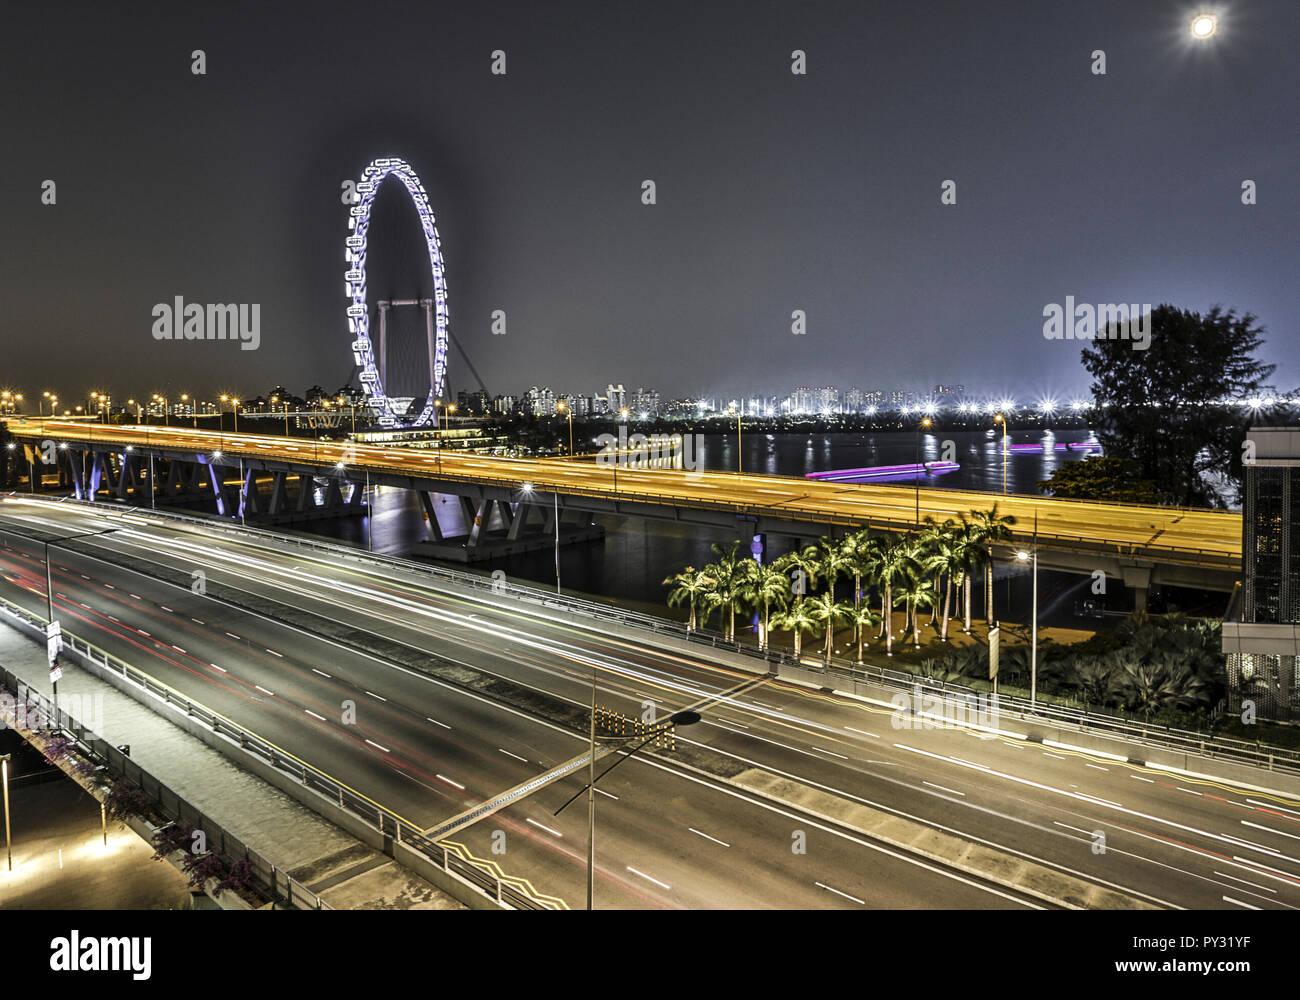 Singapur, Marina Bay, Nachtaufnahme - Stock Image